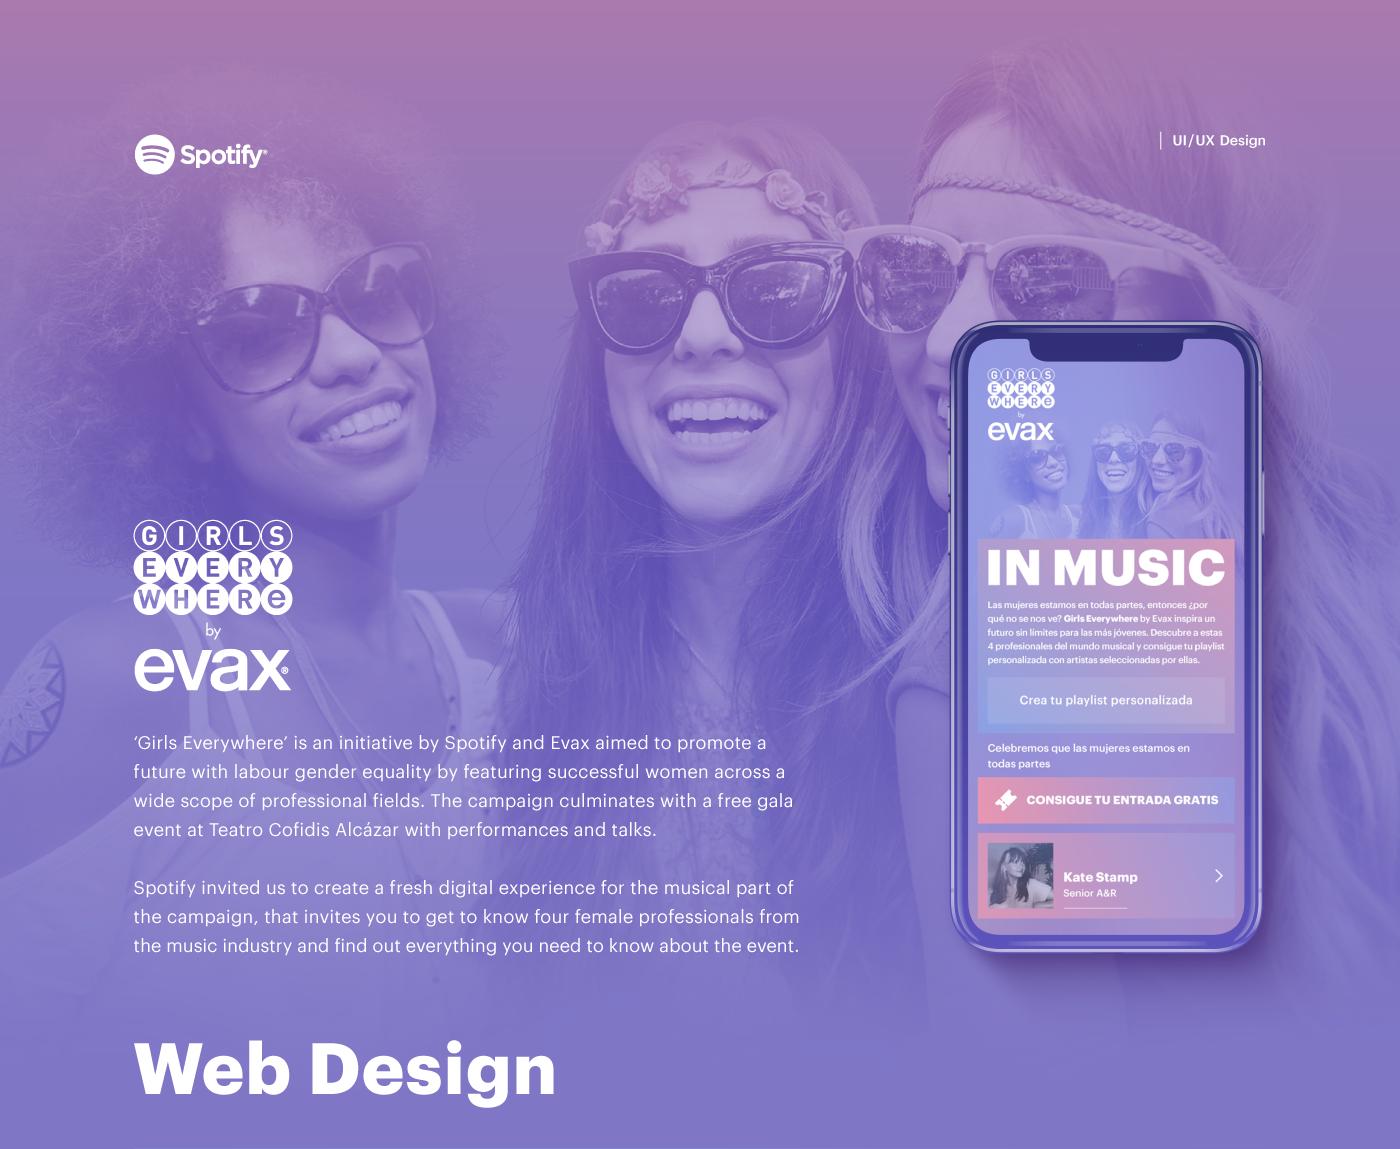 Evax & Spotify - Girls Everywhere - Digital Campaign on Behance